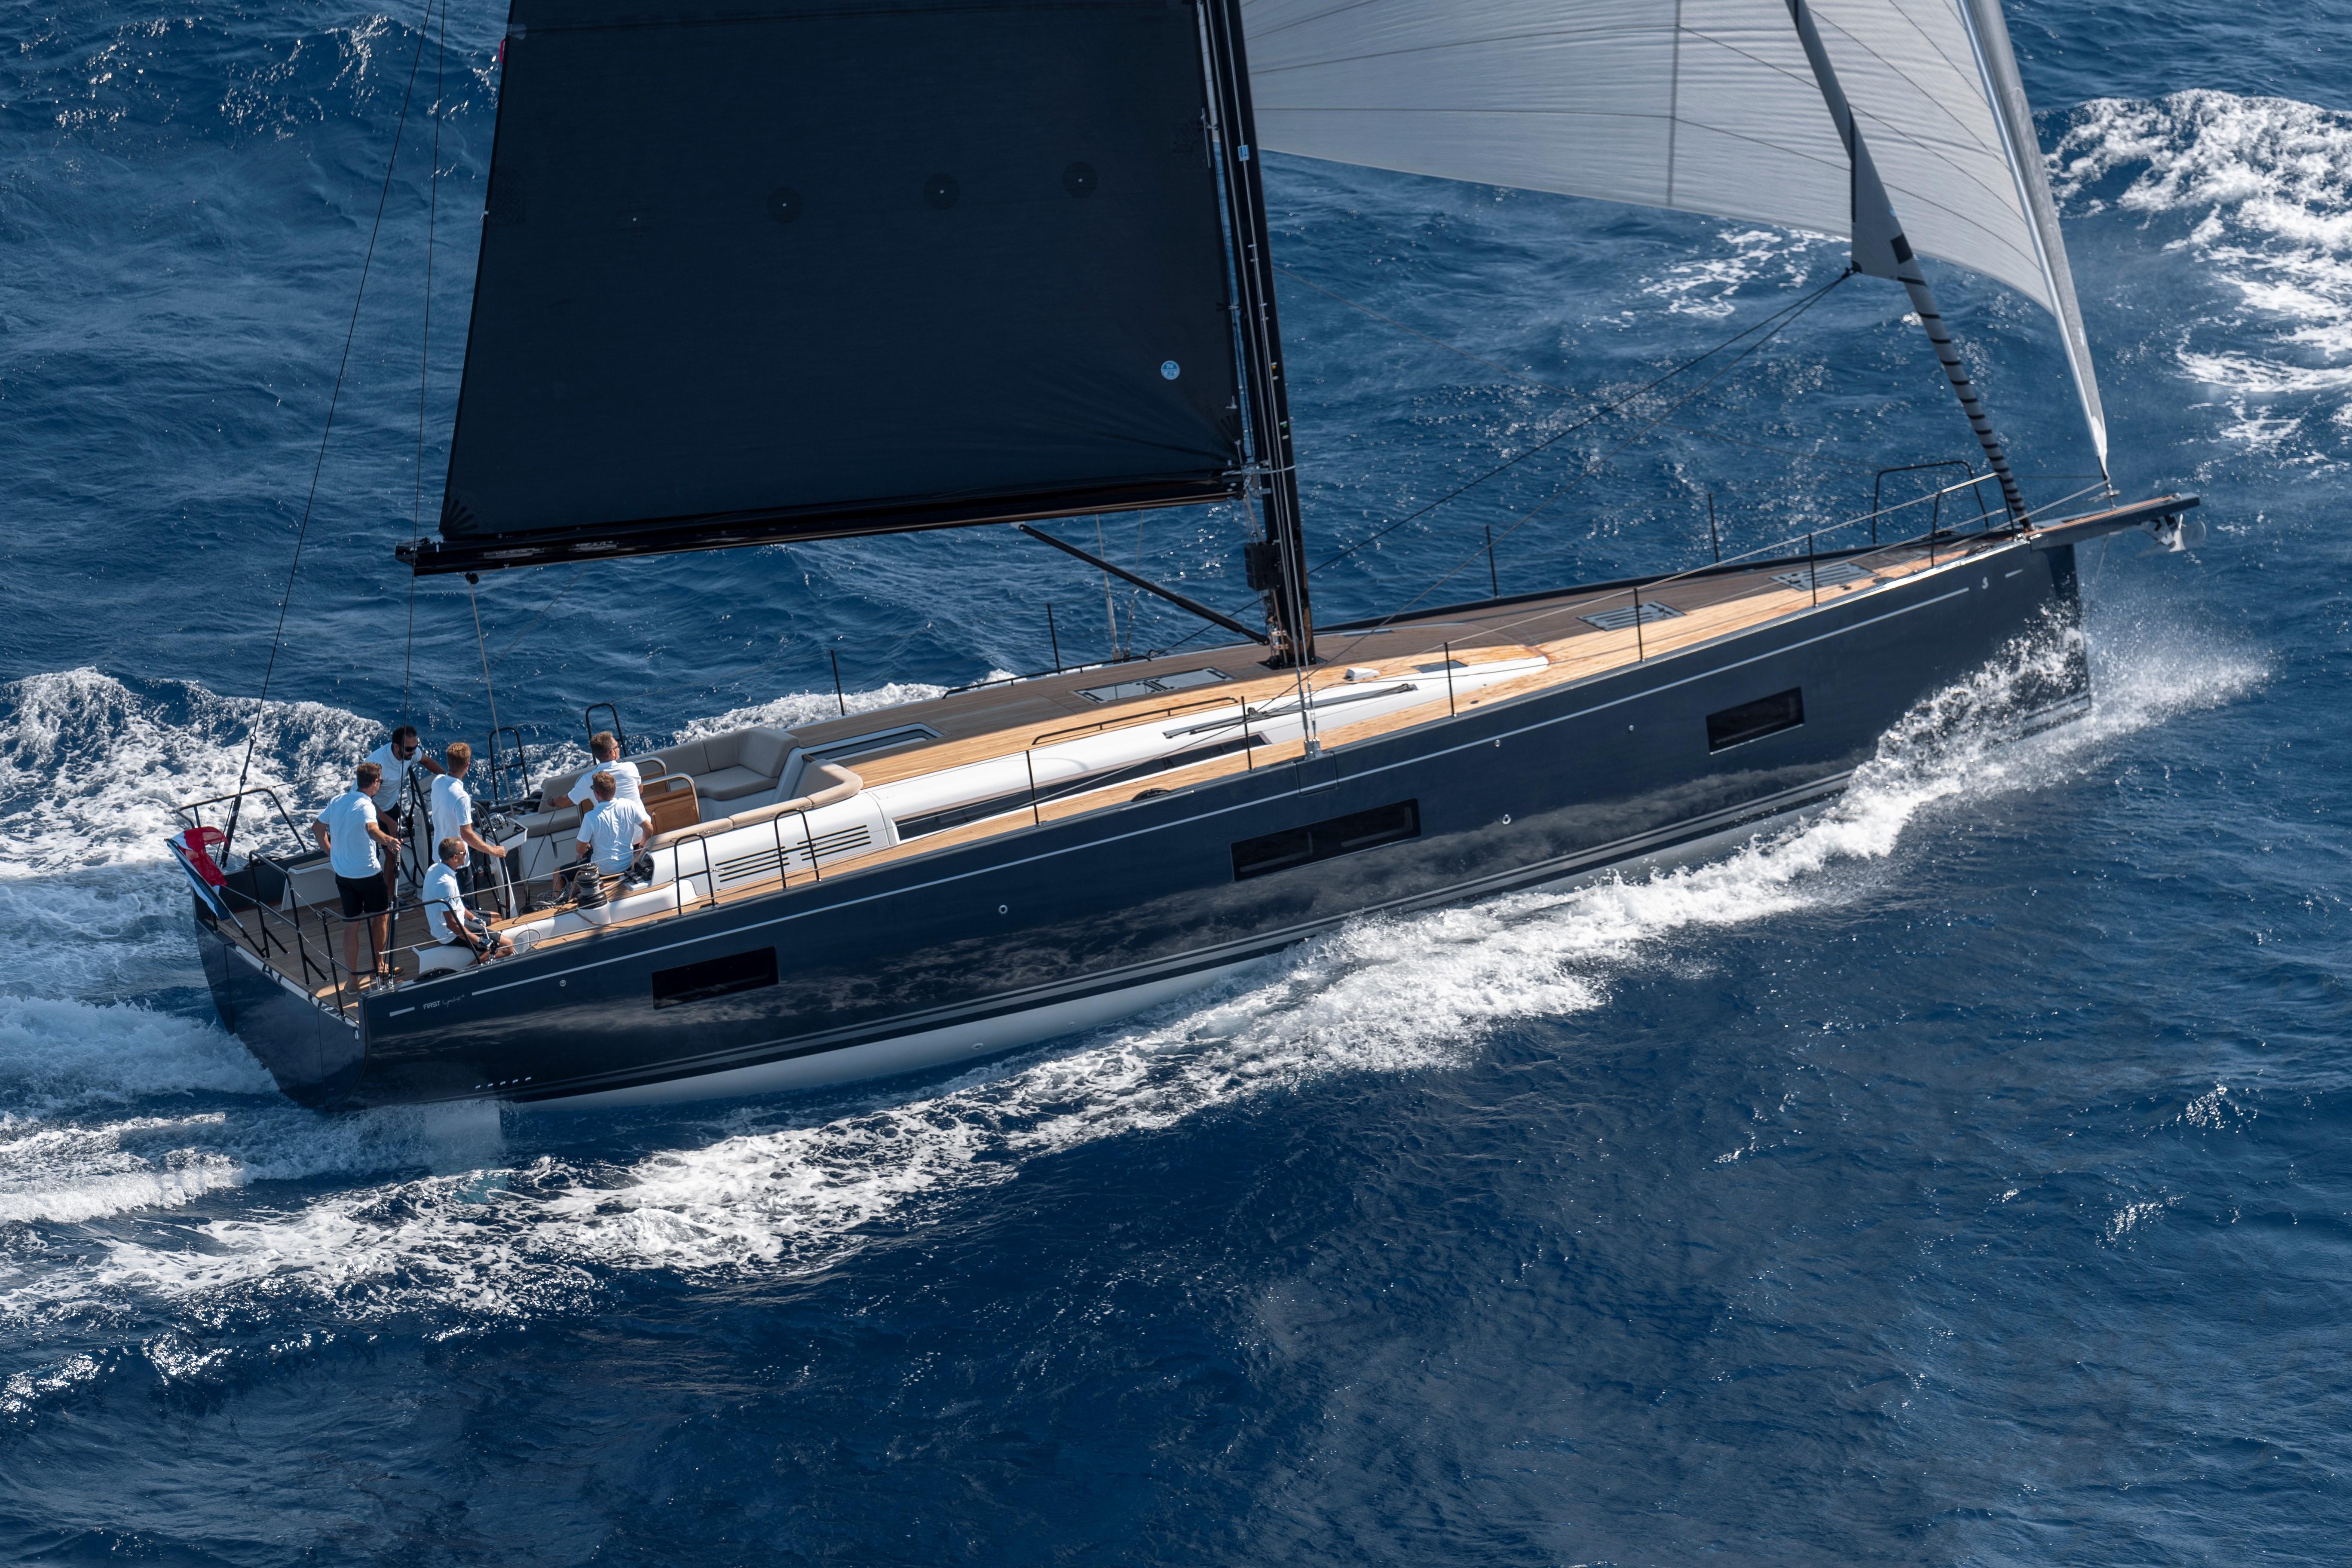 Beneteau First Yacht 53 Beneteau First Yacht 53 - Profile